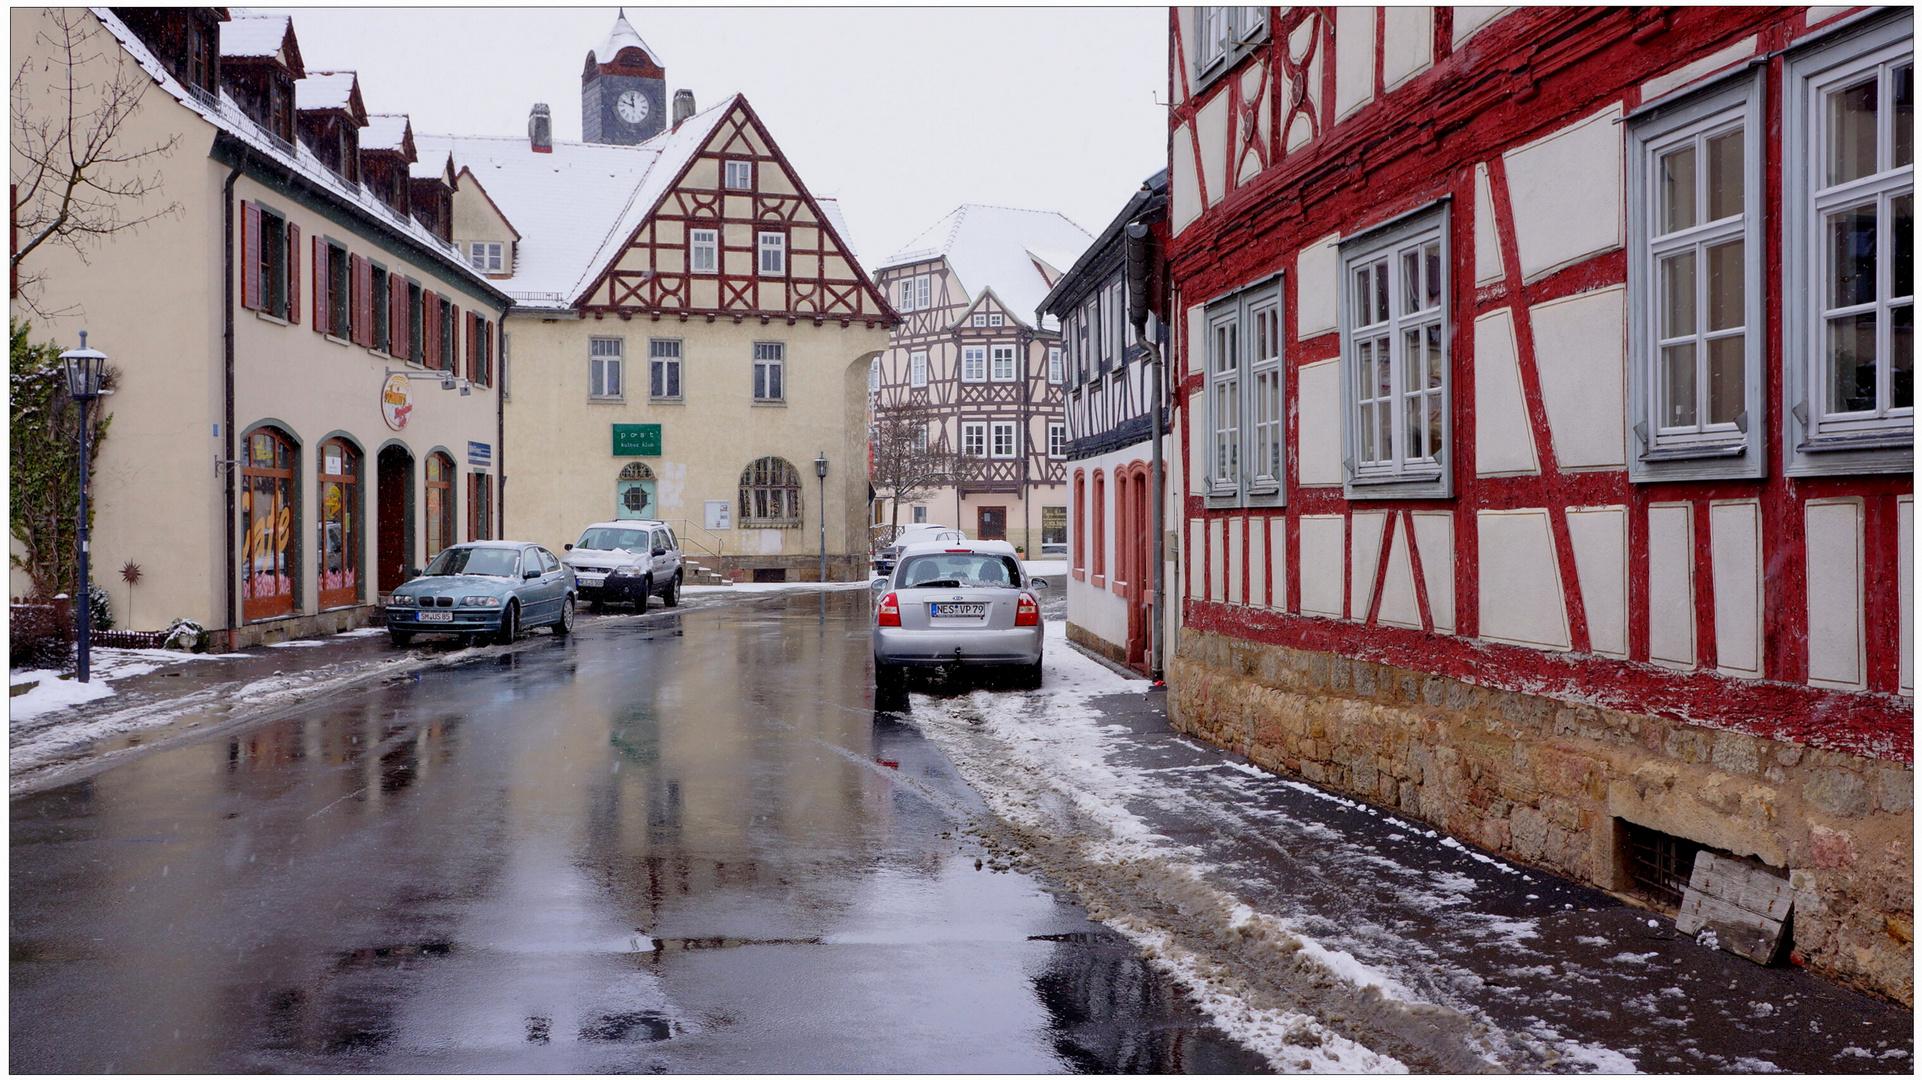 Wintereinbruch (brusco del invierno)